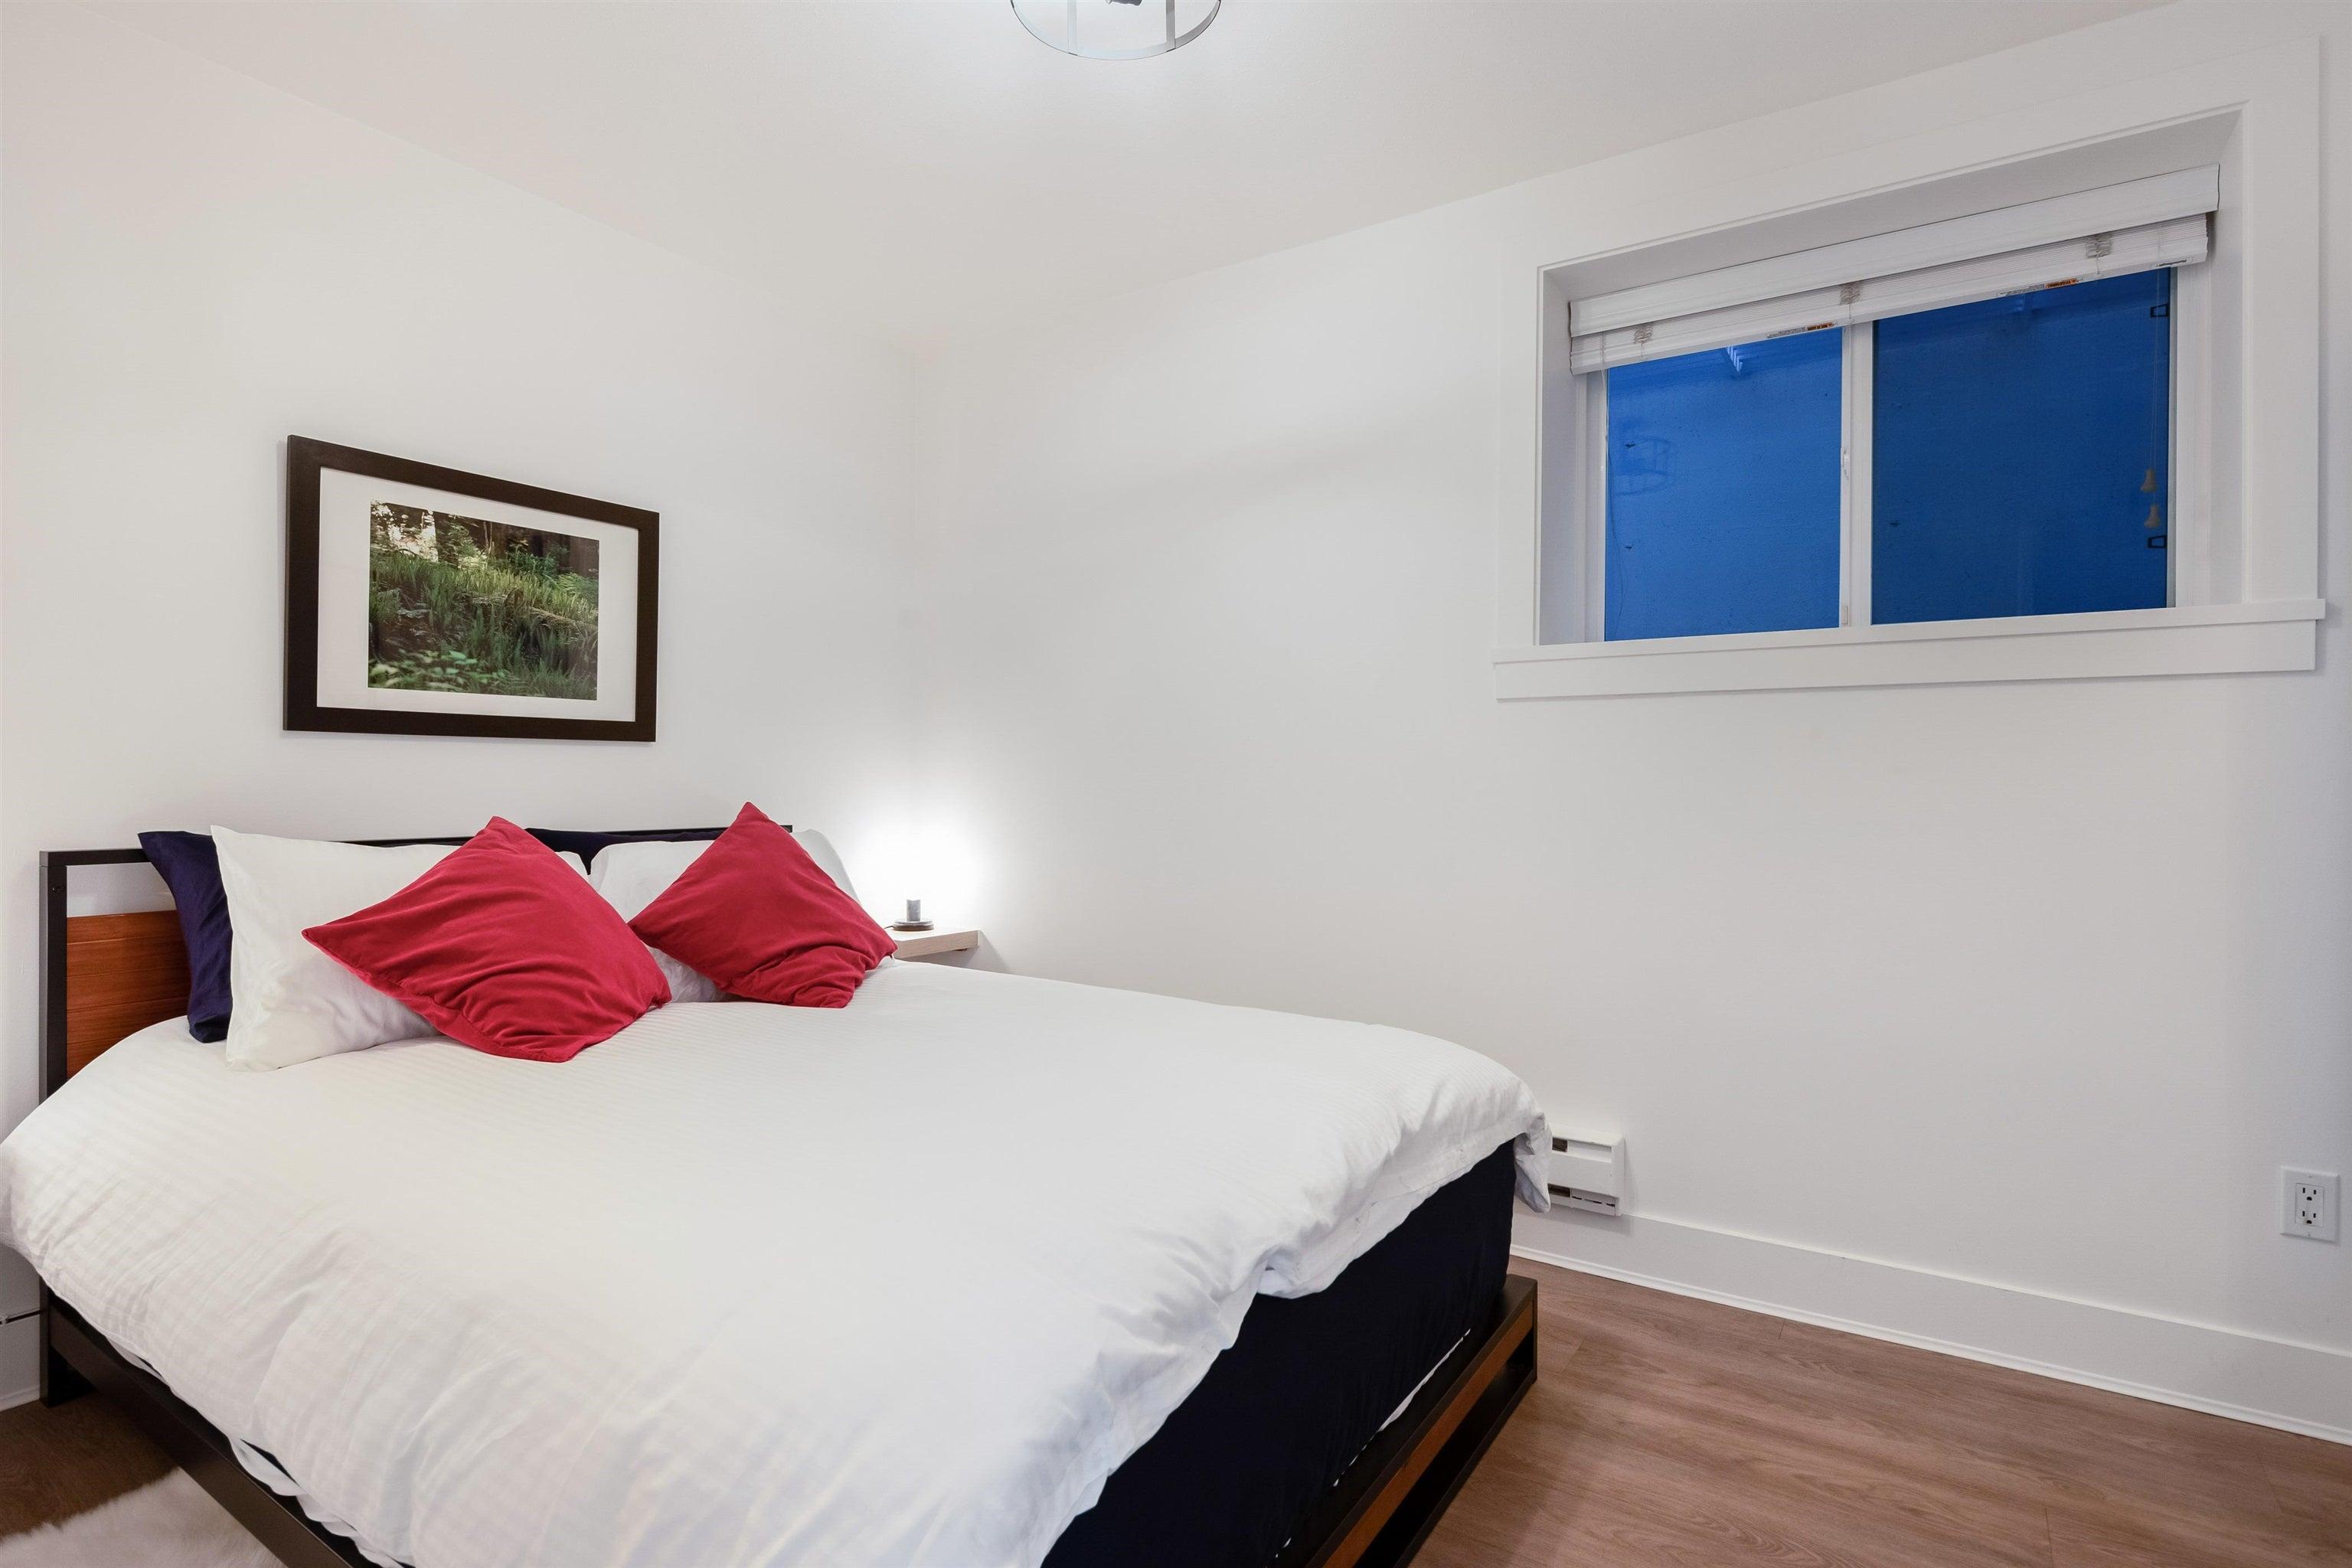 2258 WINDRIDGE DRIVE - Seymour NV House/Single Family for sale, 5 Bedrooms (R2617156) - #32